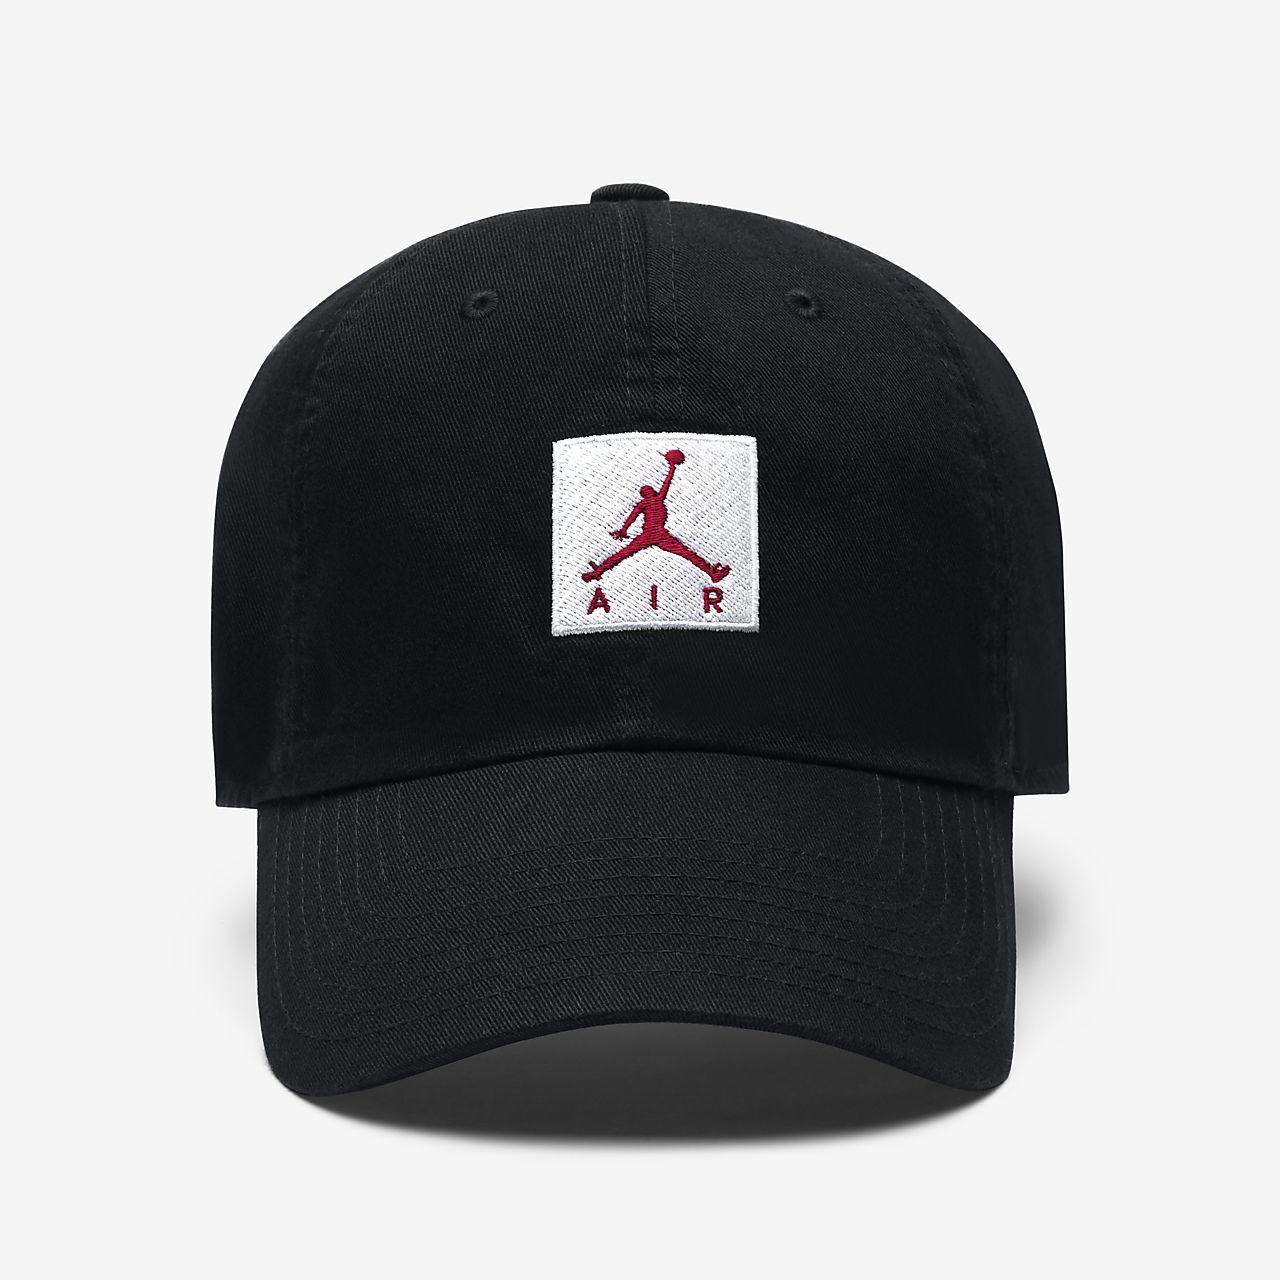 220a446be76 Air Jordan Jumpman H86 Adjustable Hat. Nike.com HR